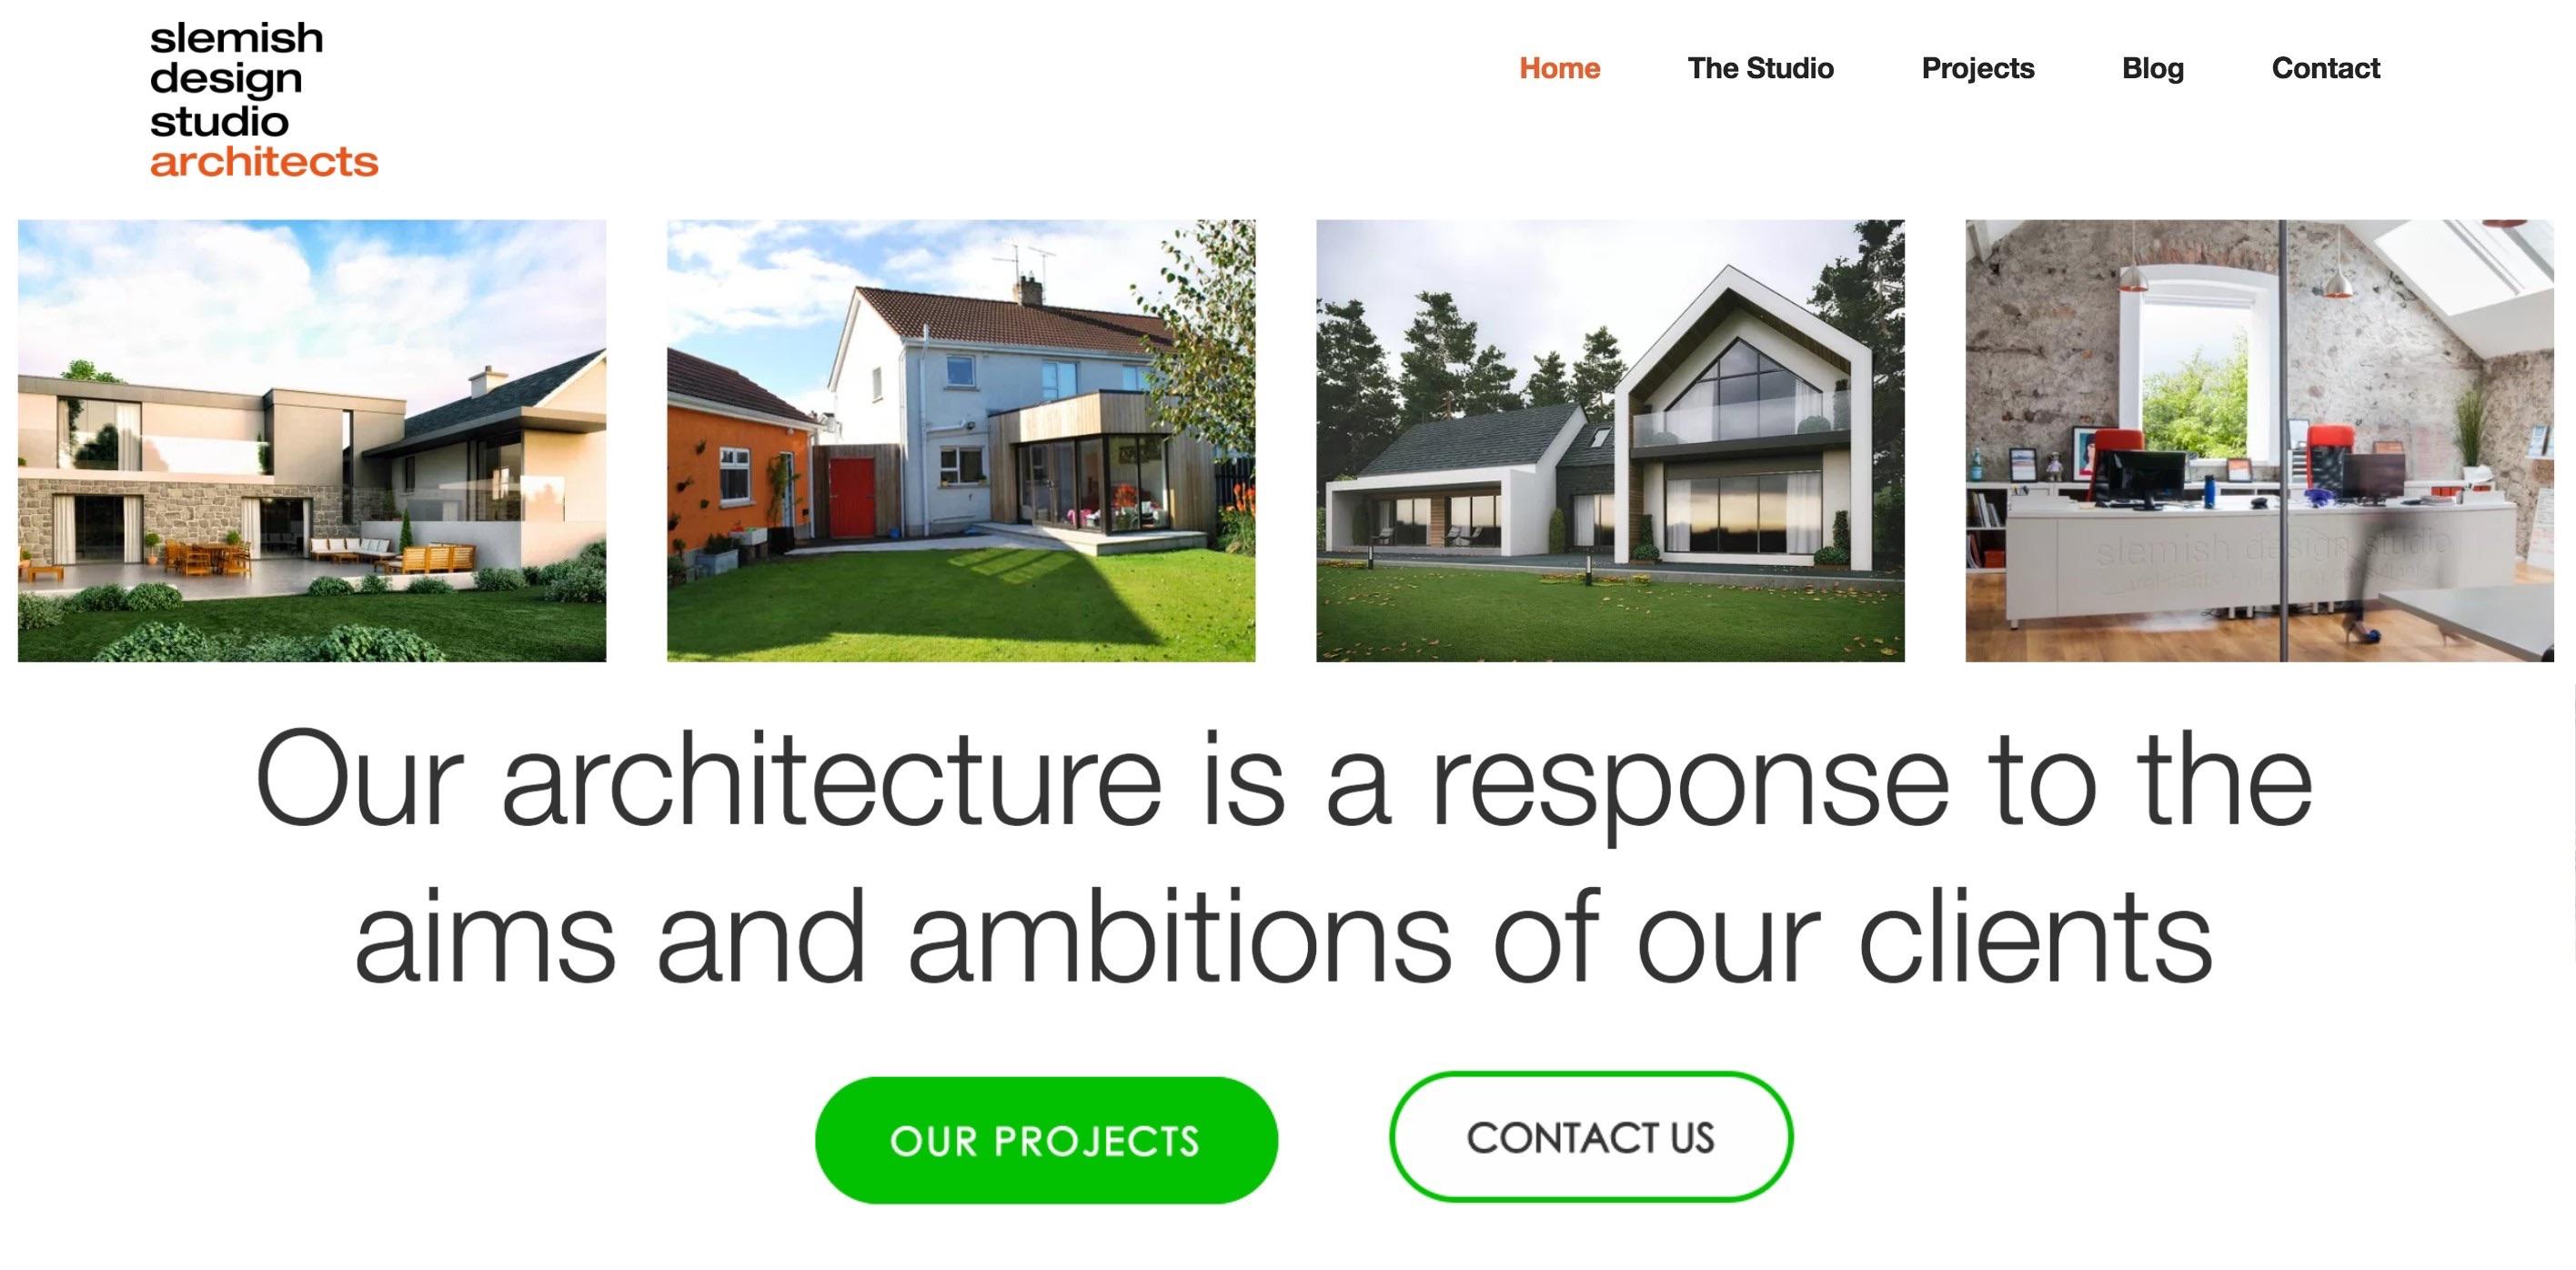 Homepage example of Slemish Design Studio Architects